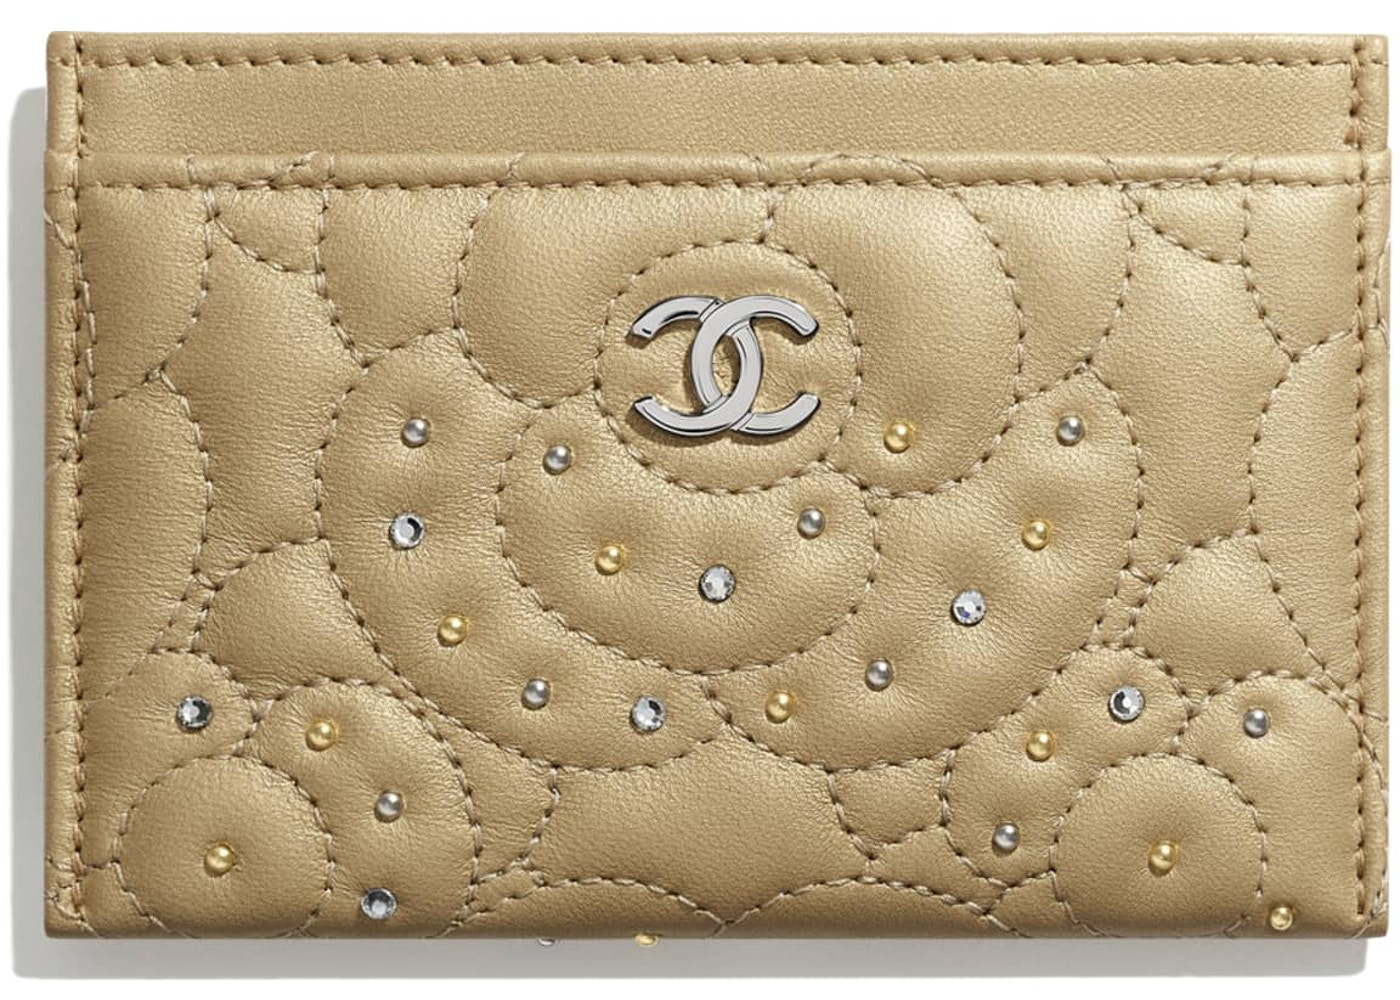 158a4dae34 Chanel Camellia Card Holder Studded Metallic Calfskin Silver/Gold ...